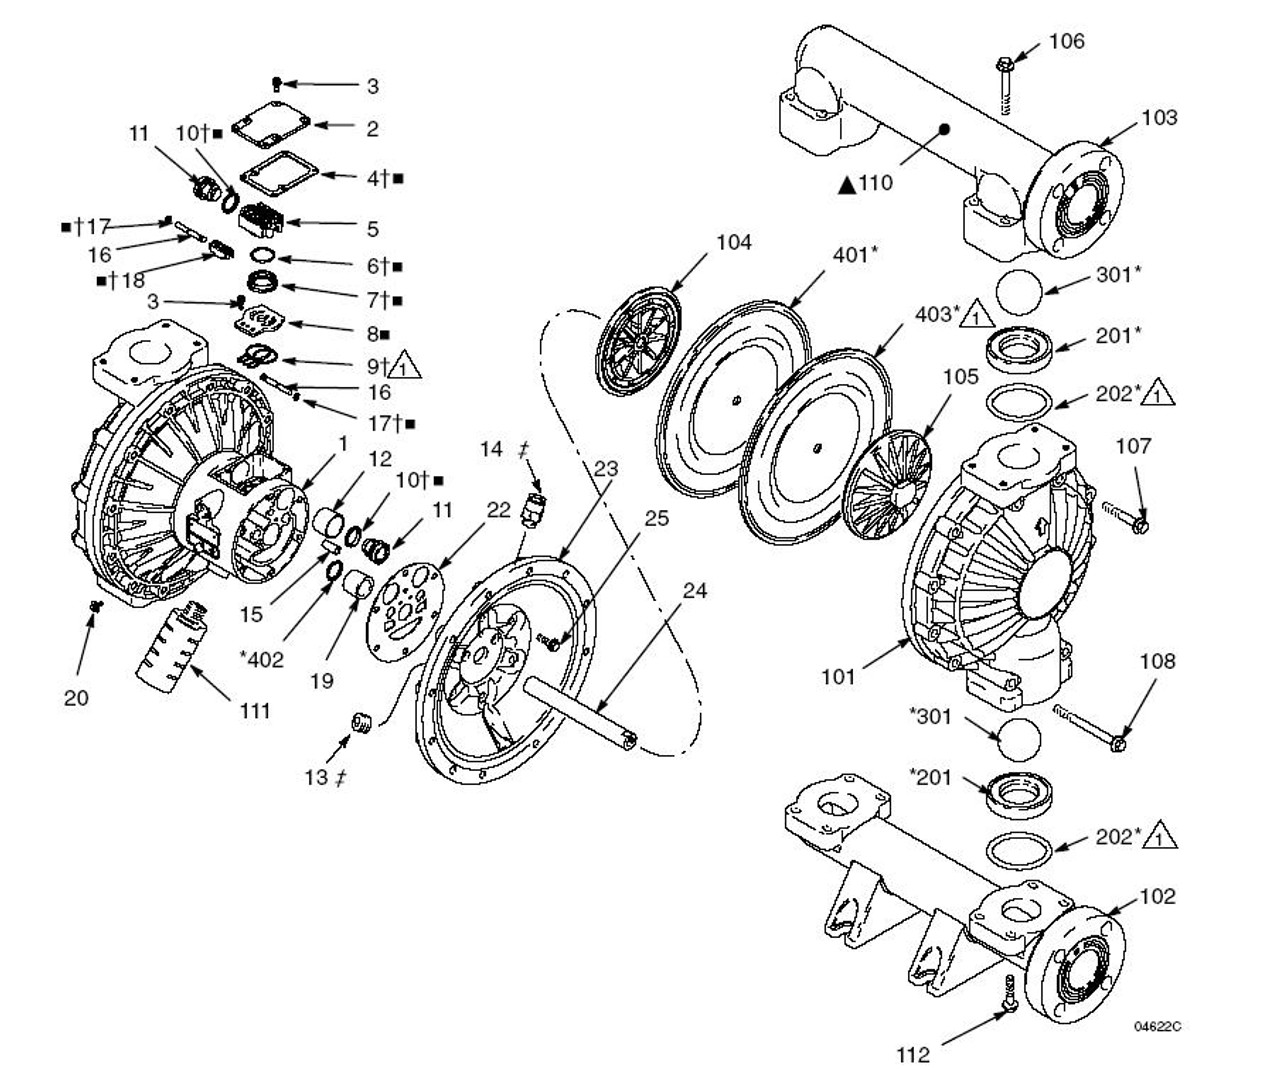 Graco Husky 1590 Diaphragm Pump Fluid Kit w/ Buna-N Seat